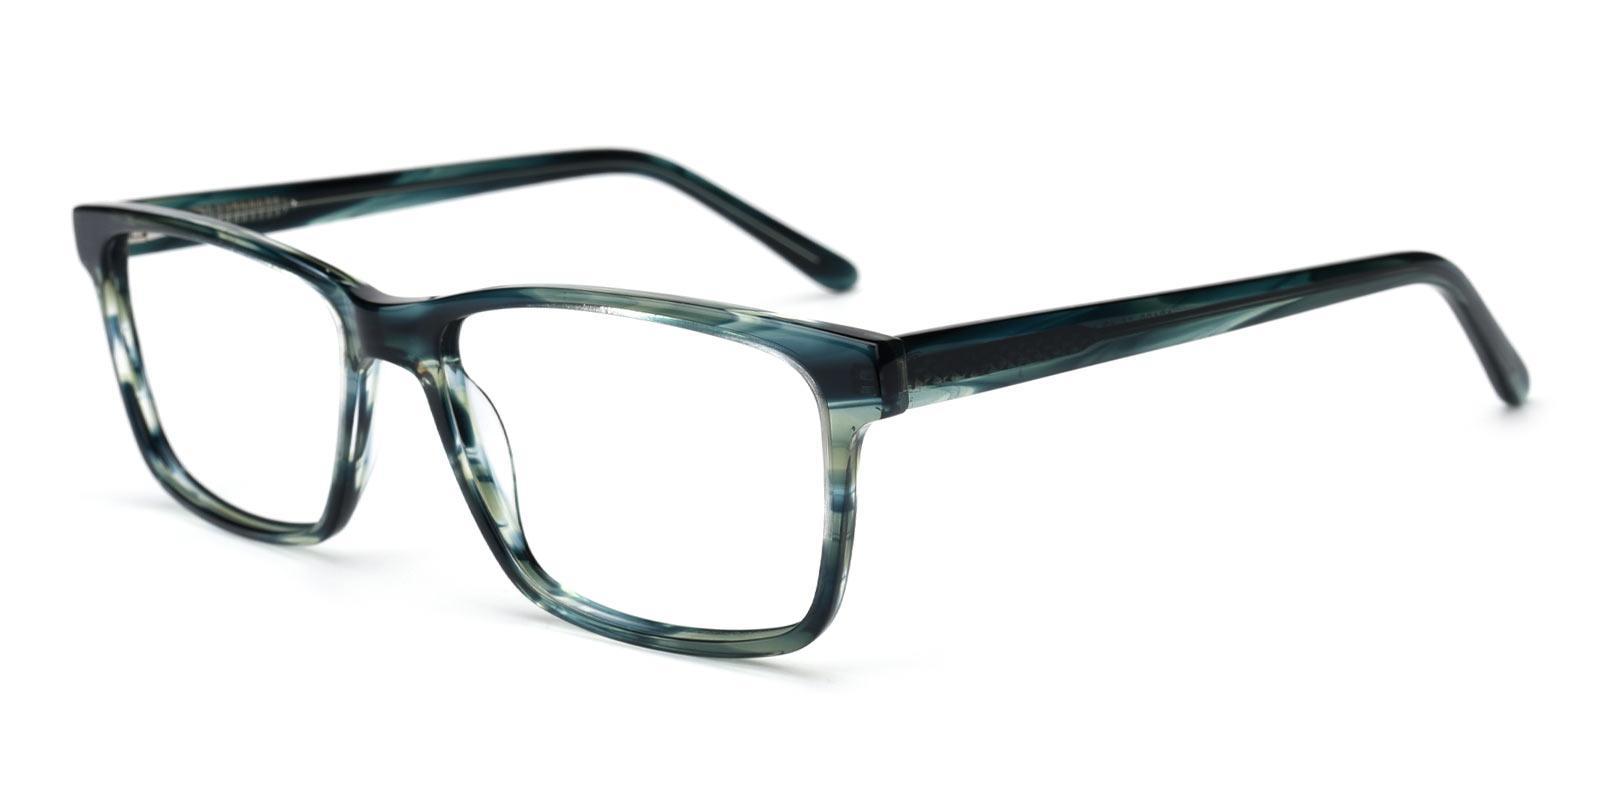 Sharon-Green-Rectangle-TR-Eyeglasses-additional1